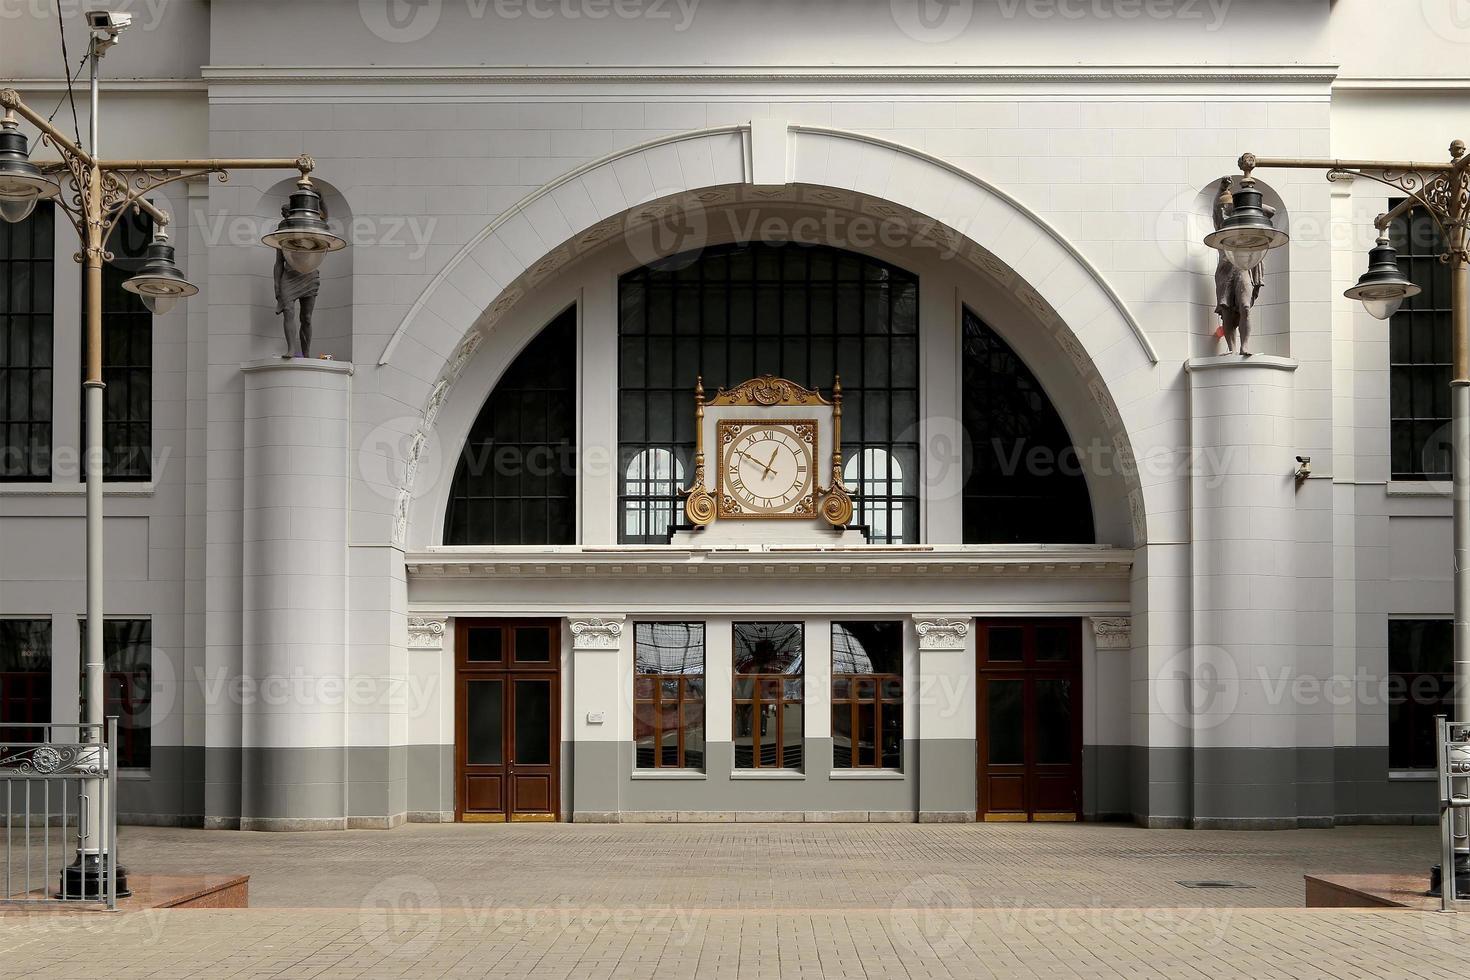 kiyevskaya stazione ferroviaria di mosca, russia foto